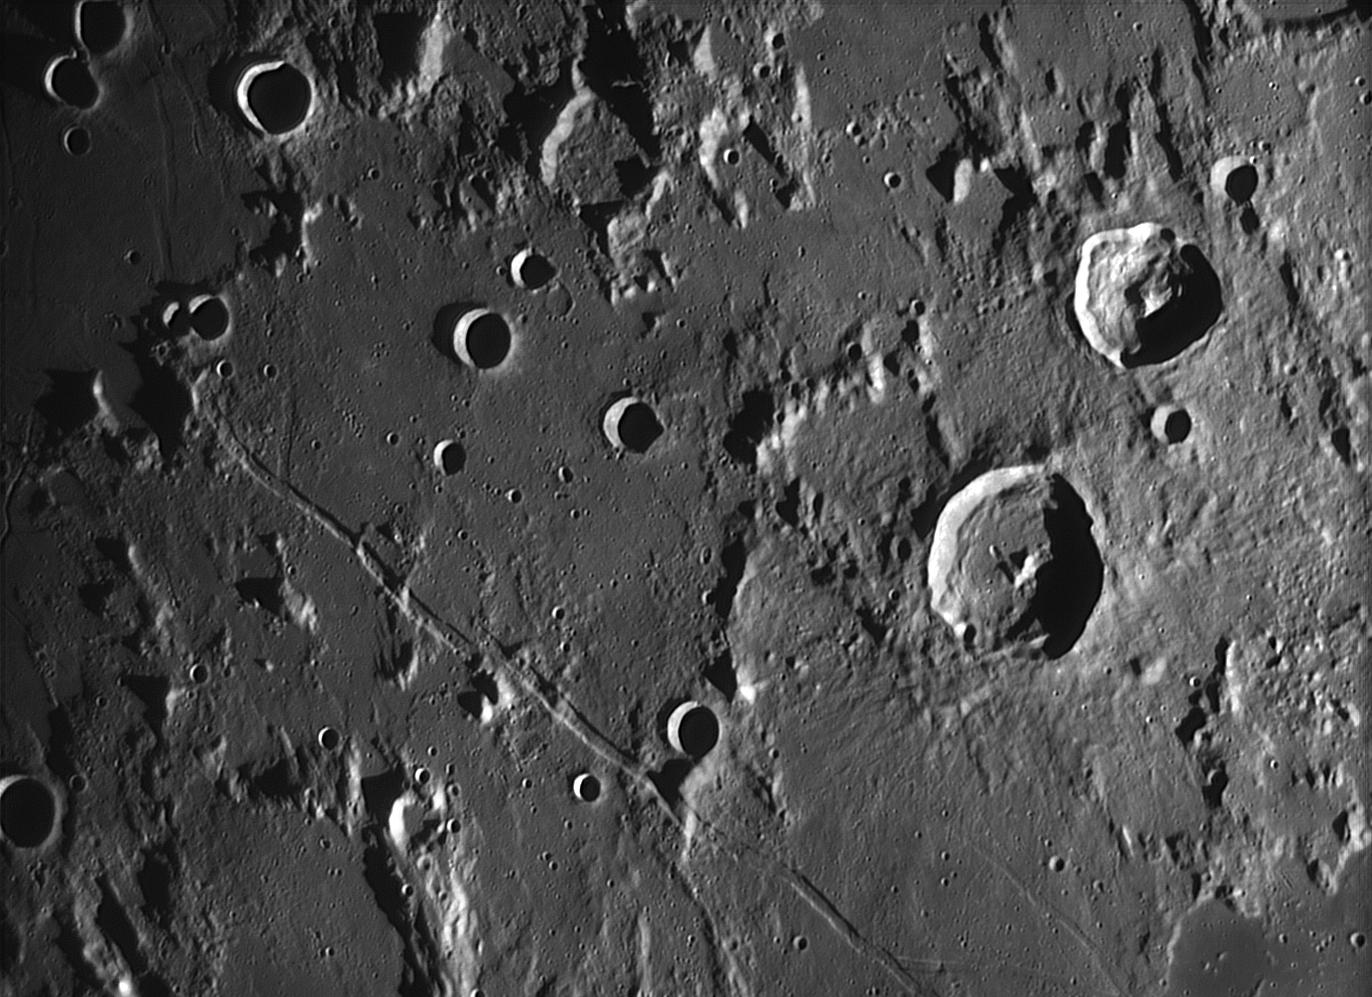 Index of viladrich astro moon closeup - Moon close up ...